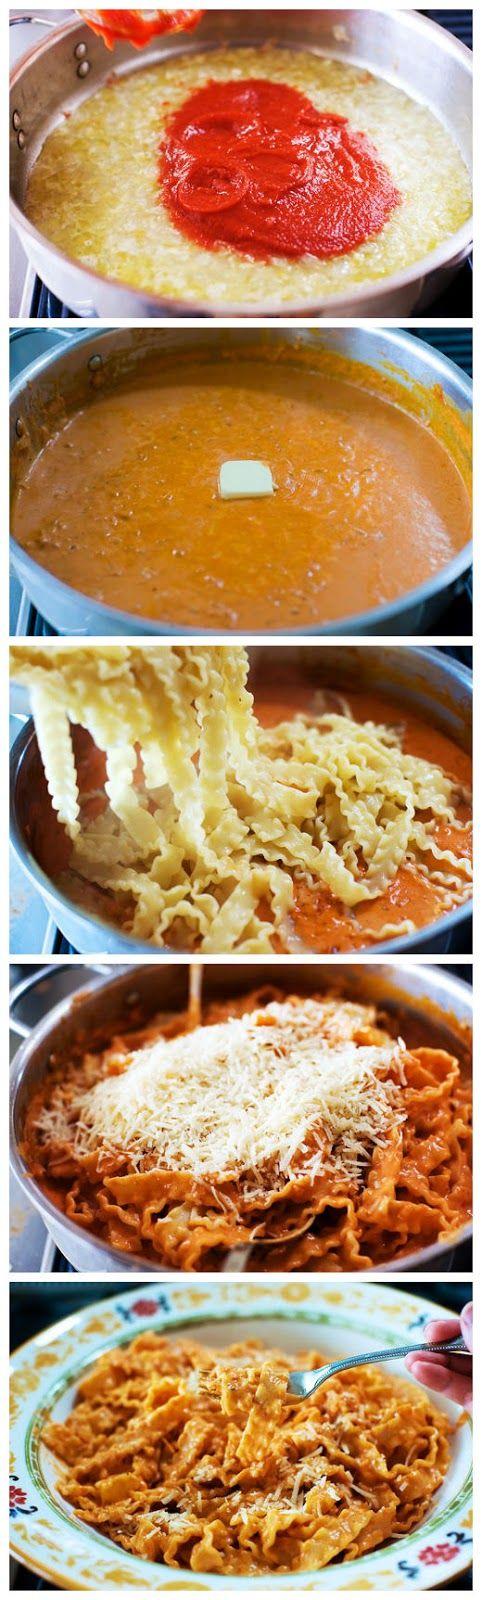 toptenlook: Pasta Alla Vodka | food love | Pinterest